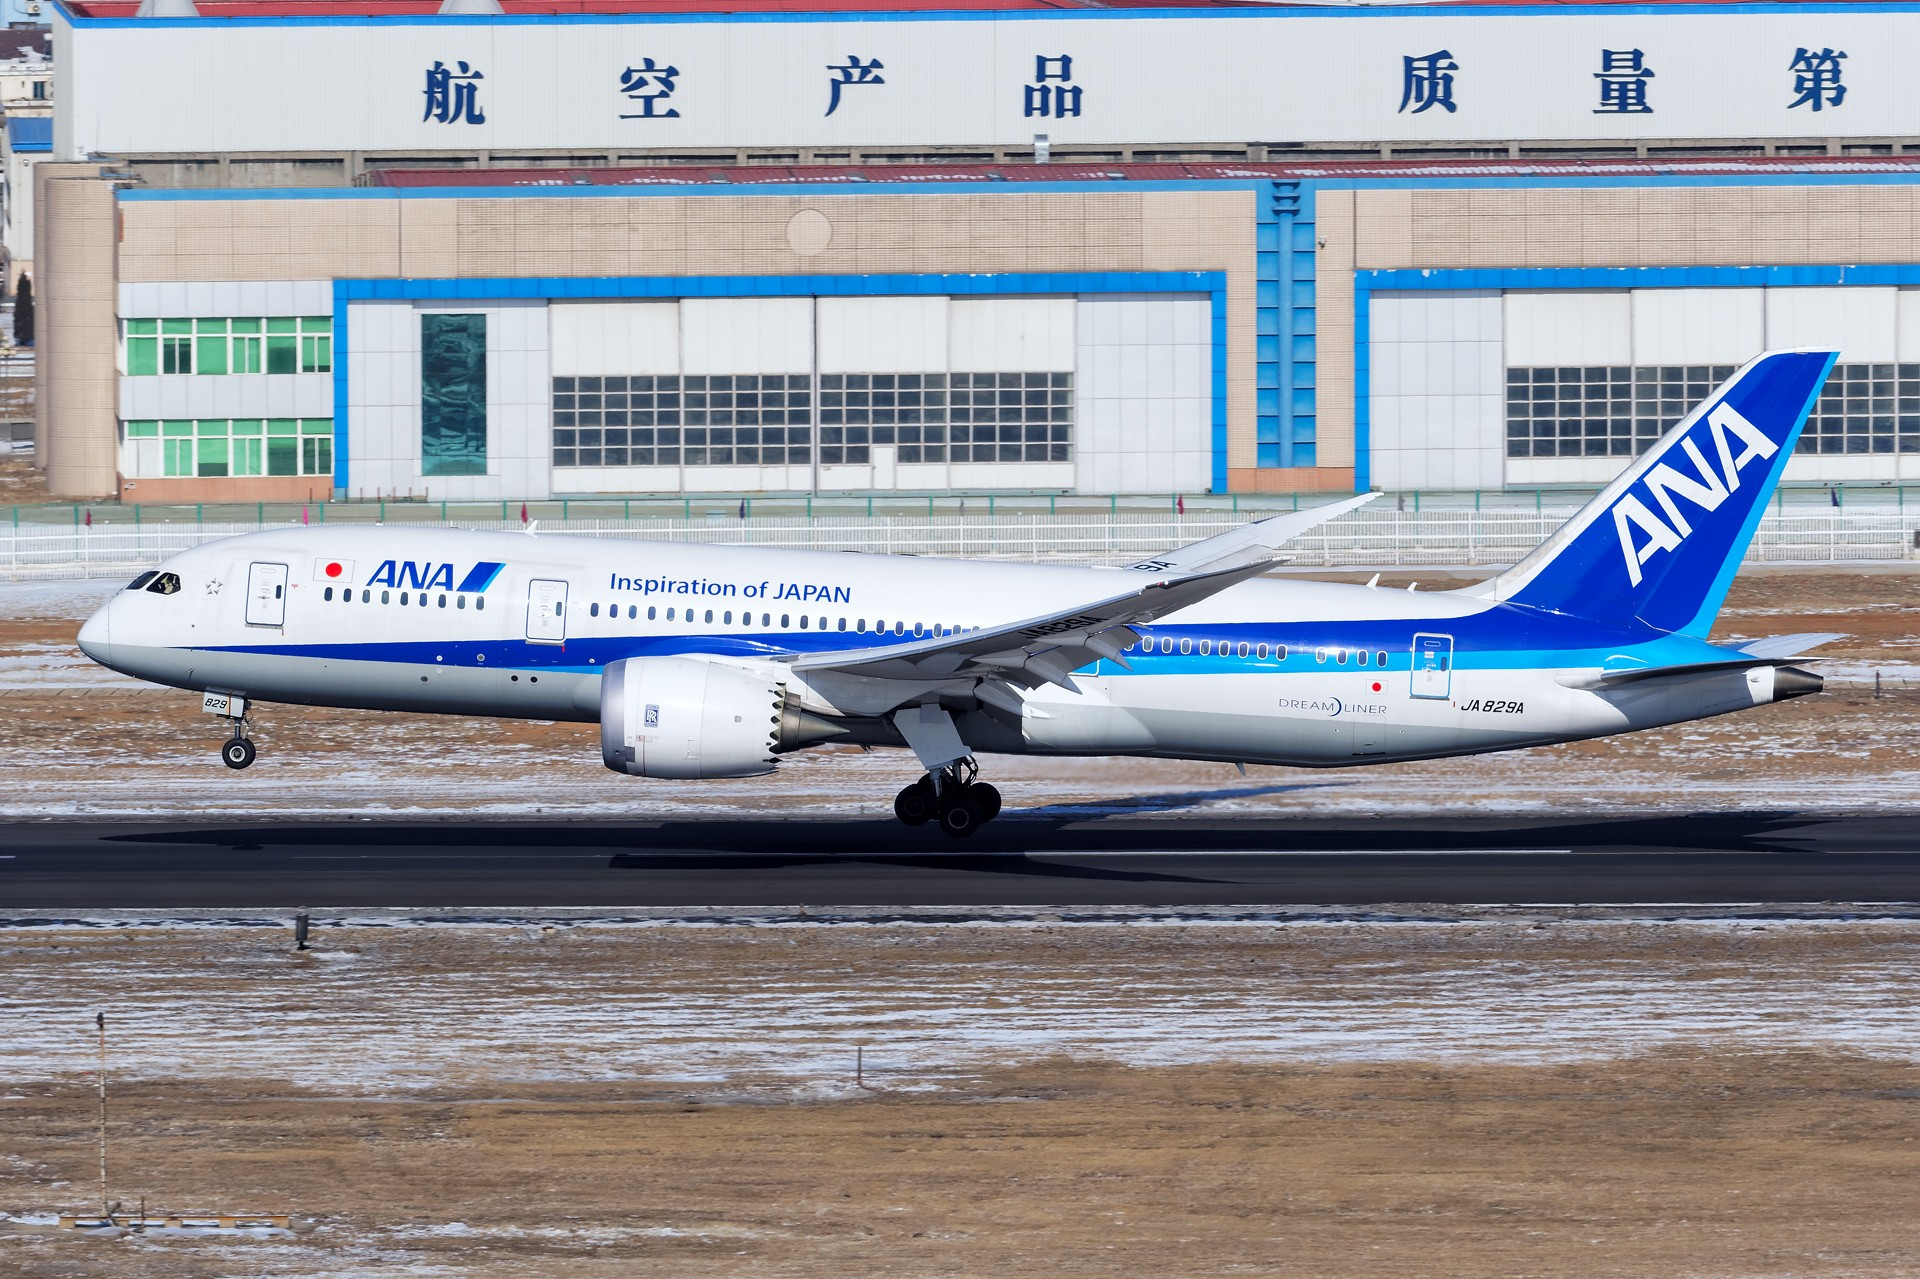 Re:[原创]★[DLC]一点有趣的事情(国庆加点儿料)★ BOEING 787-8 JA829A 中国大连国际机场